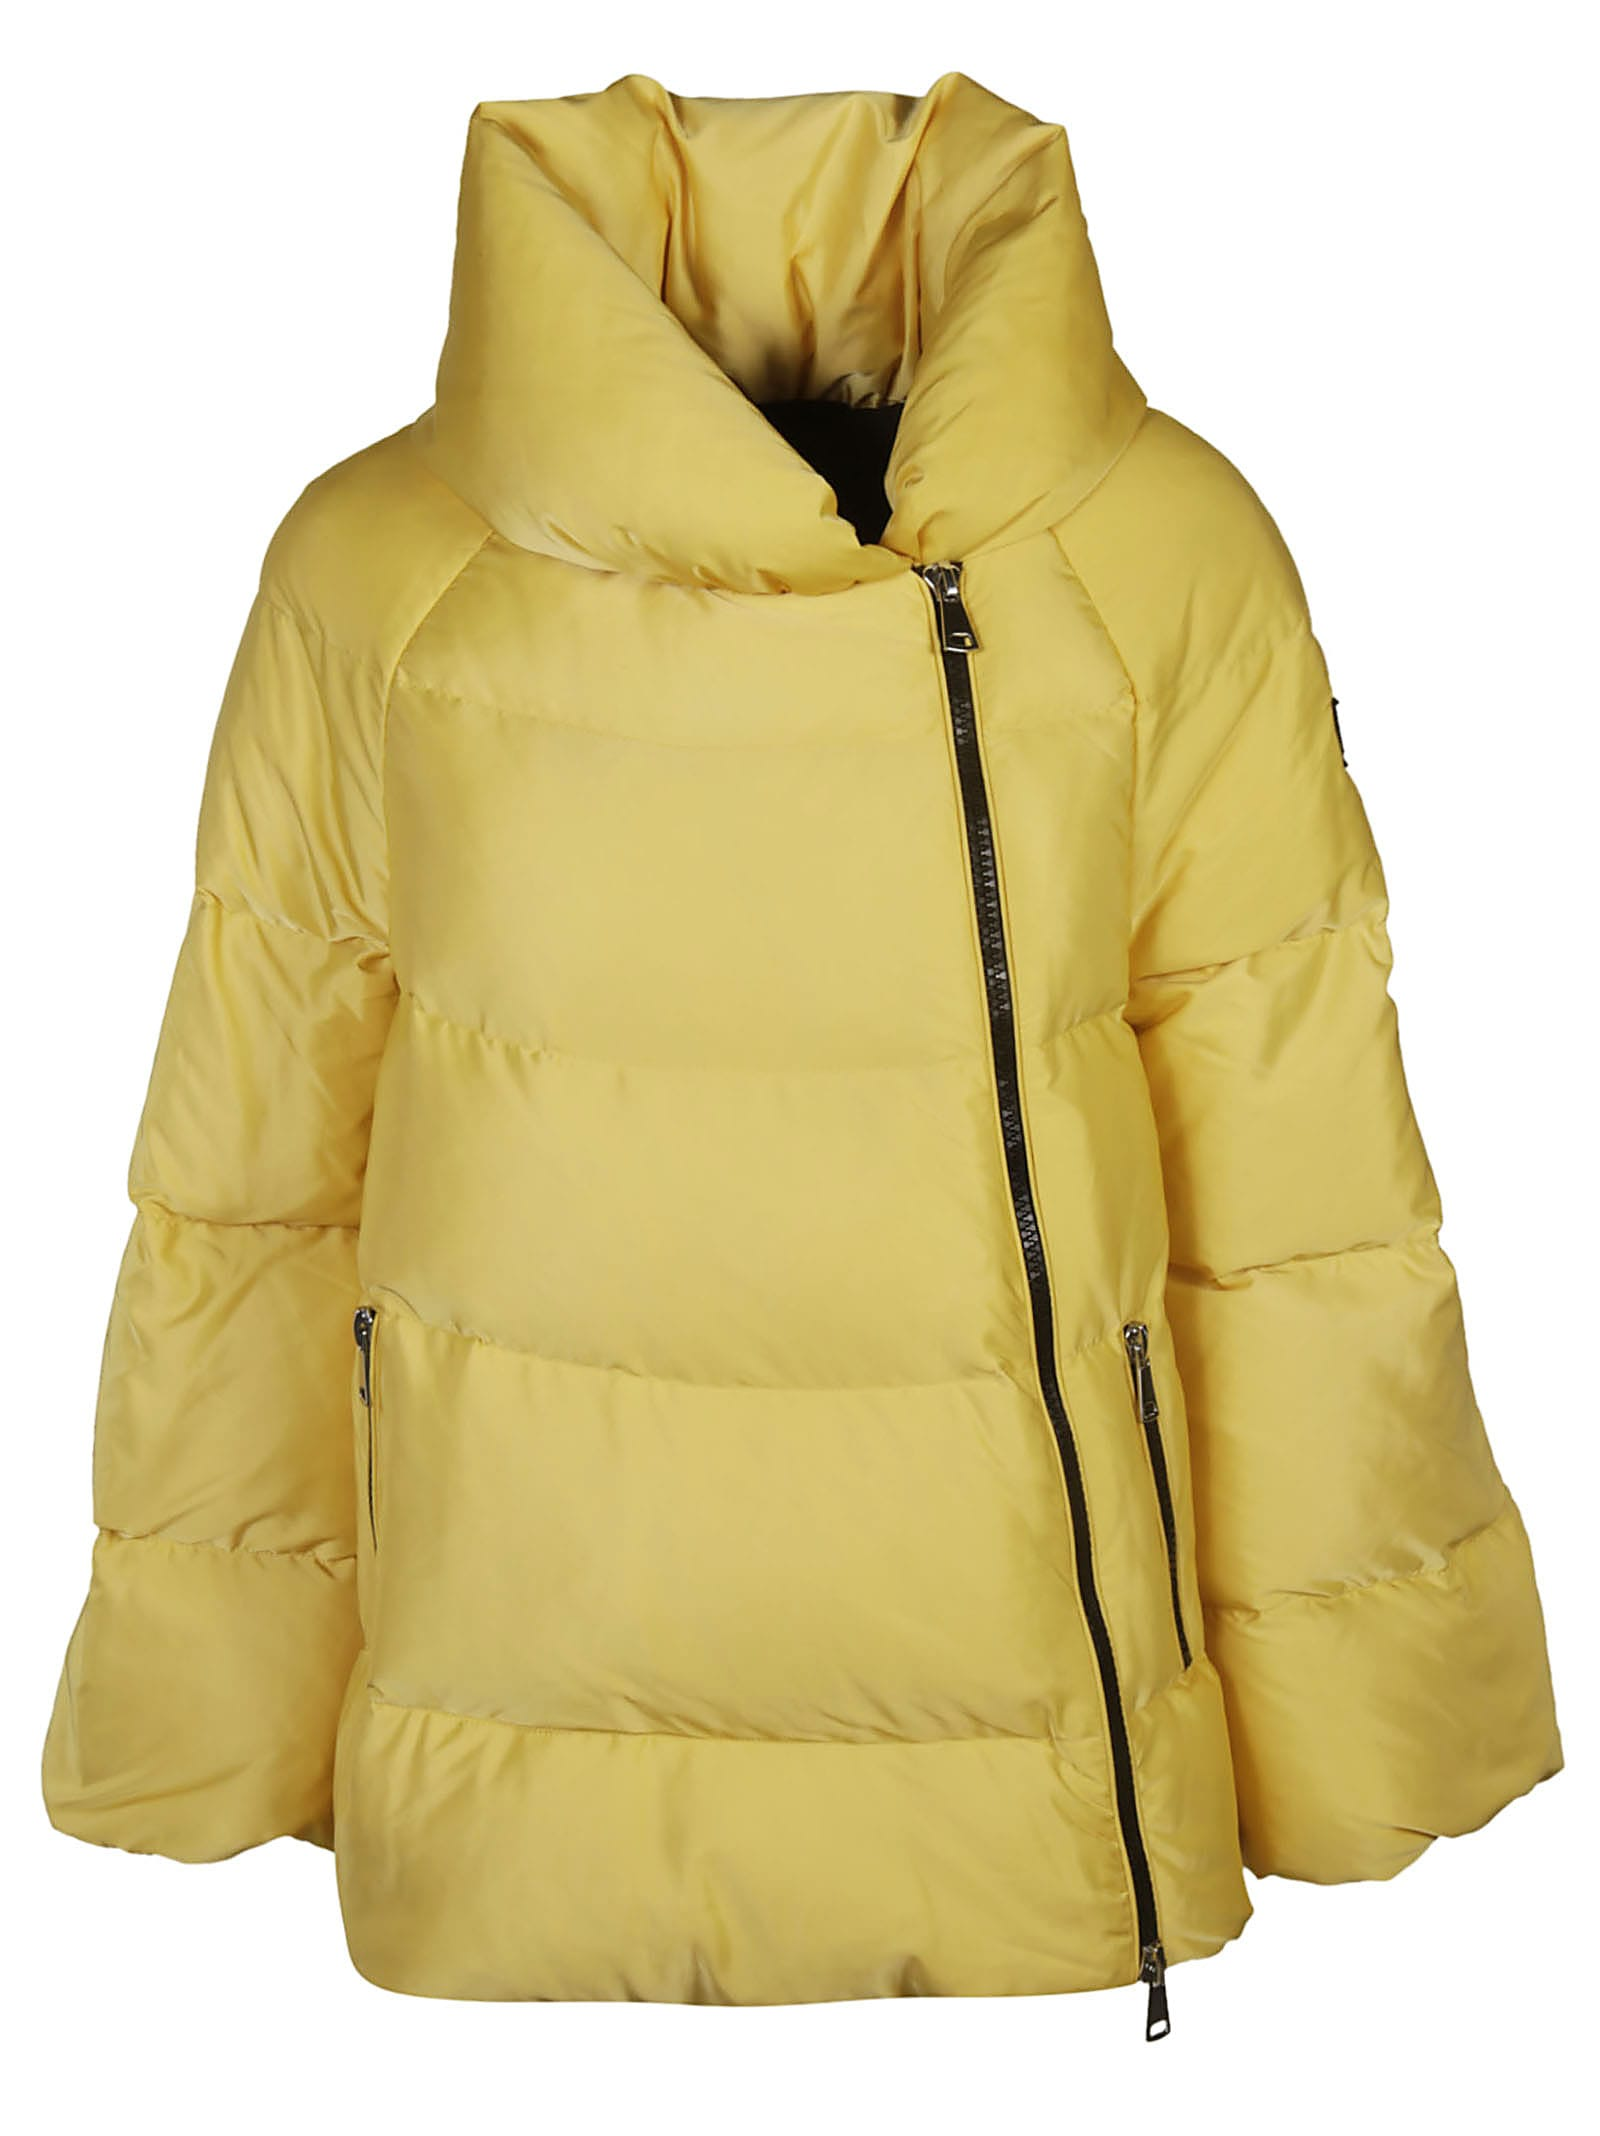 Ermanno Scervino Zipped Padded Jacket